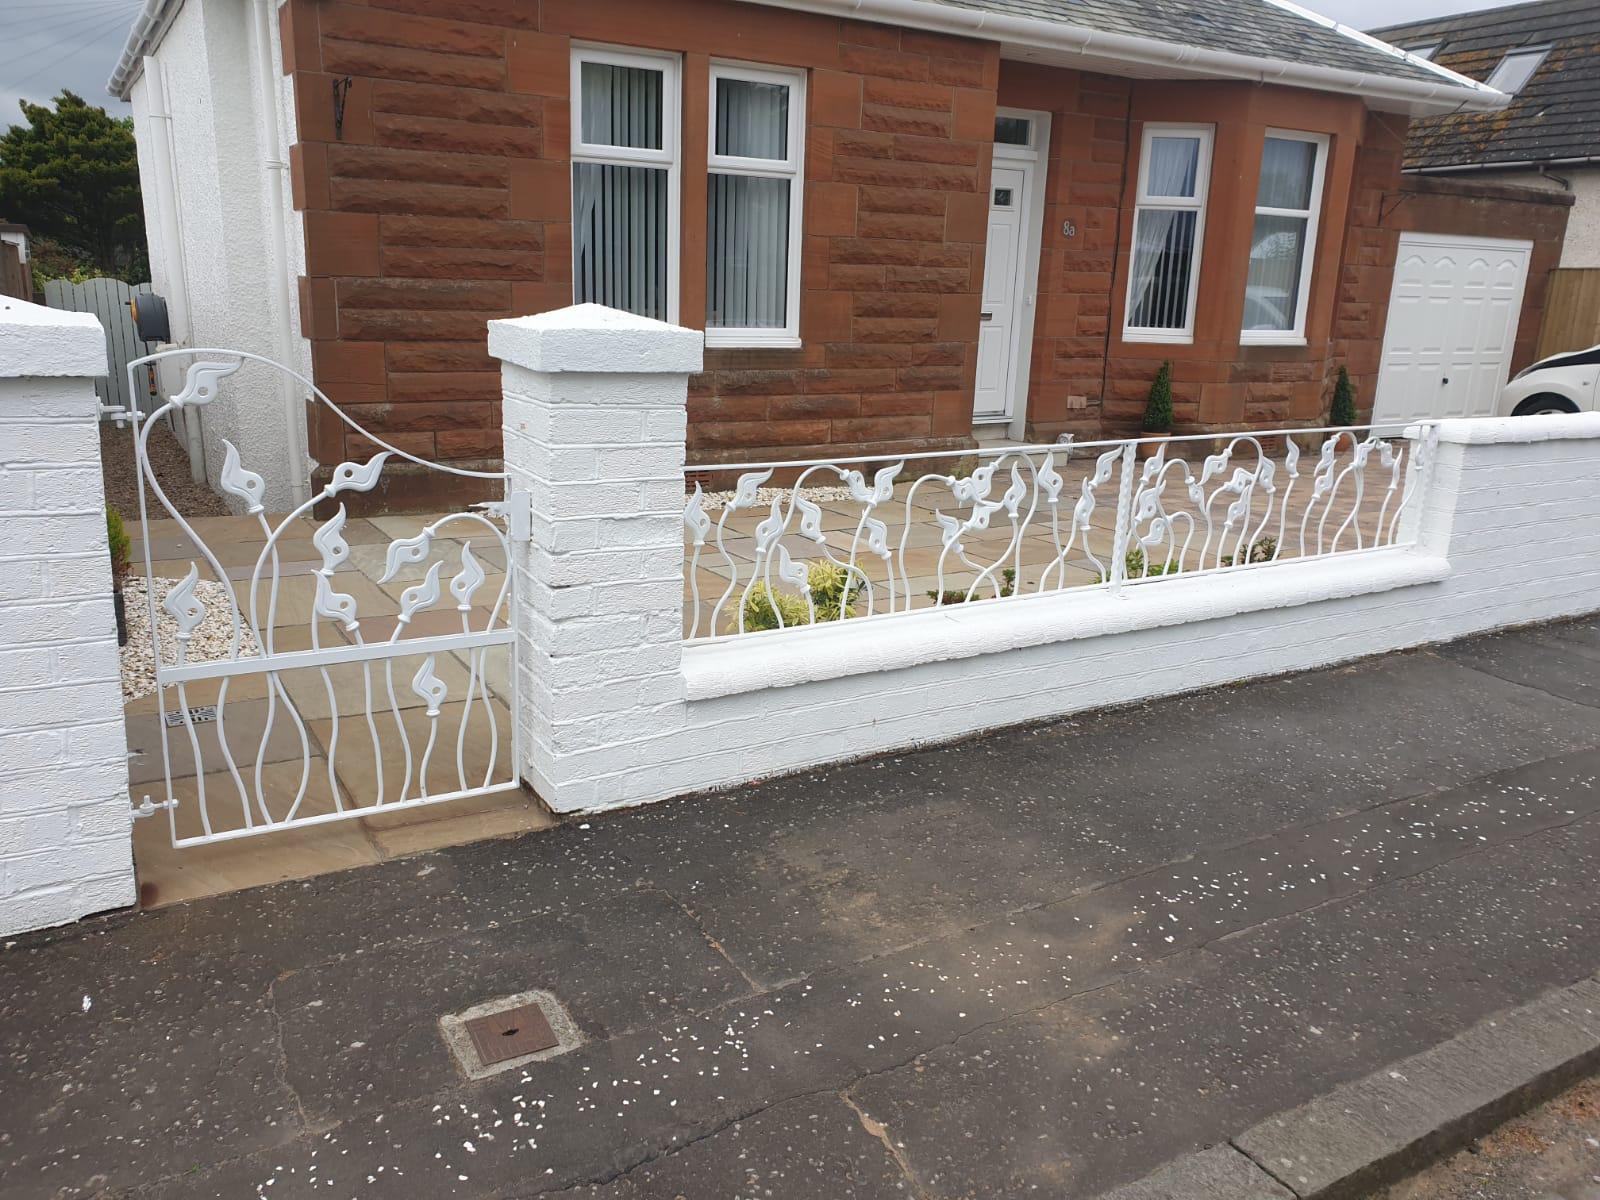 Custom wrought iron railing and gate by Dain Art Iron